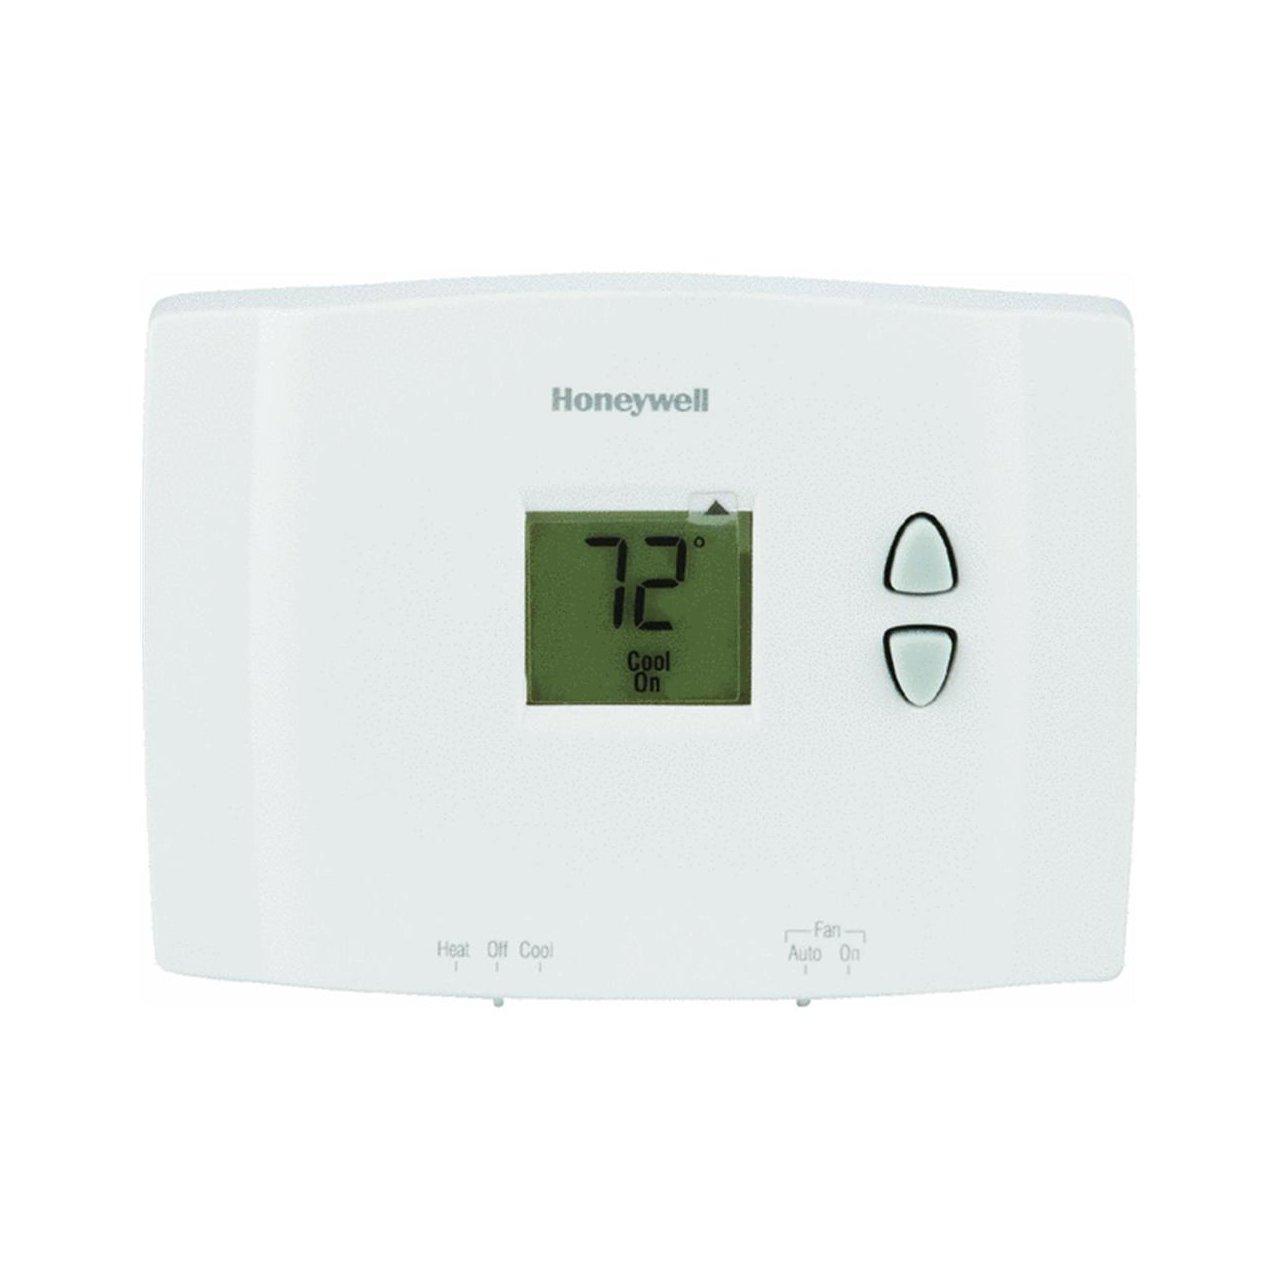 Honeywell Rth111b H C Digital Manual Thermostat Household Mercury S Thermostats